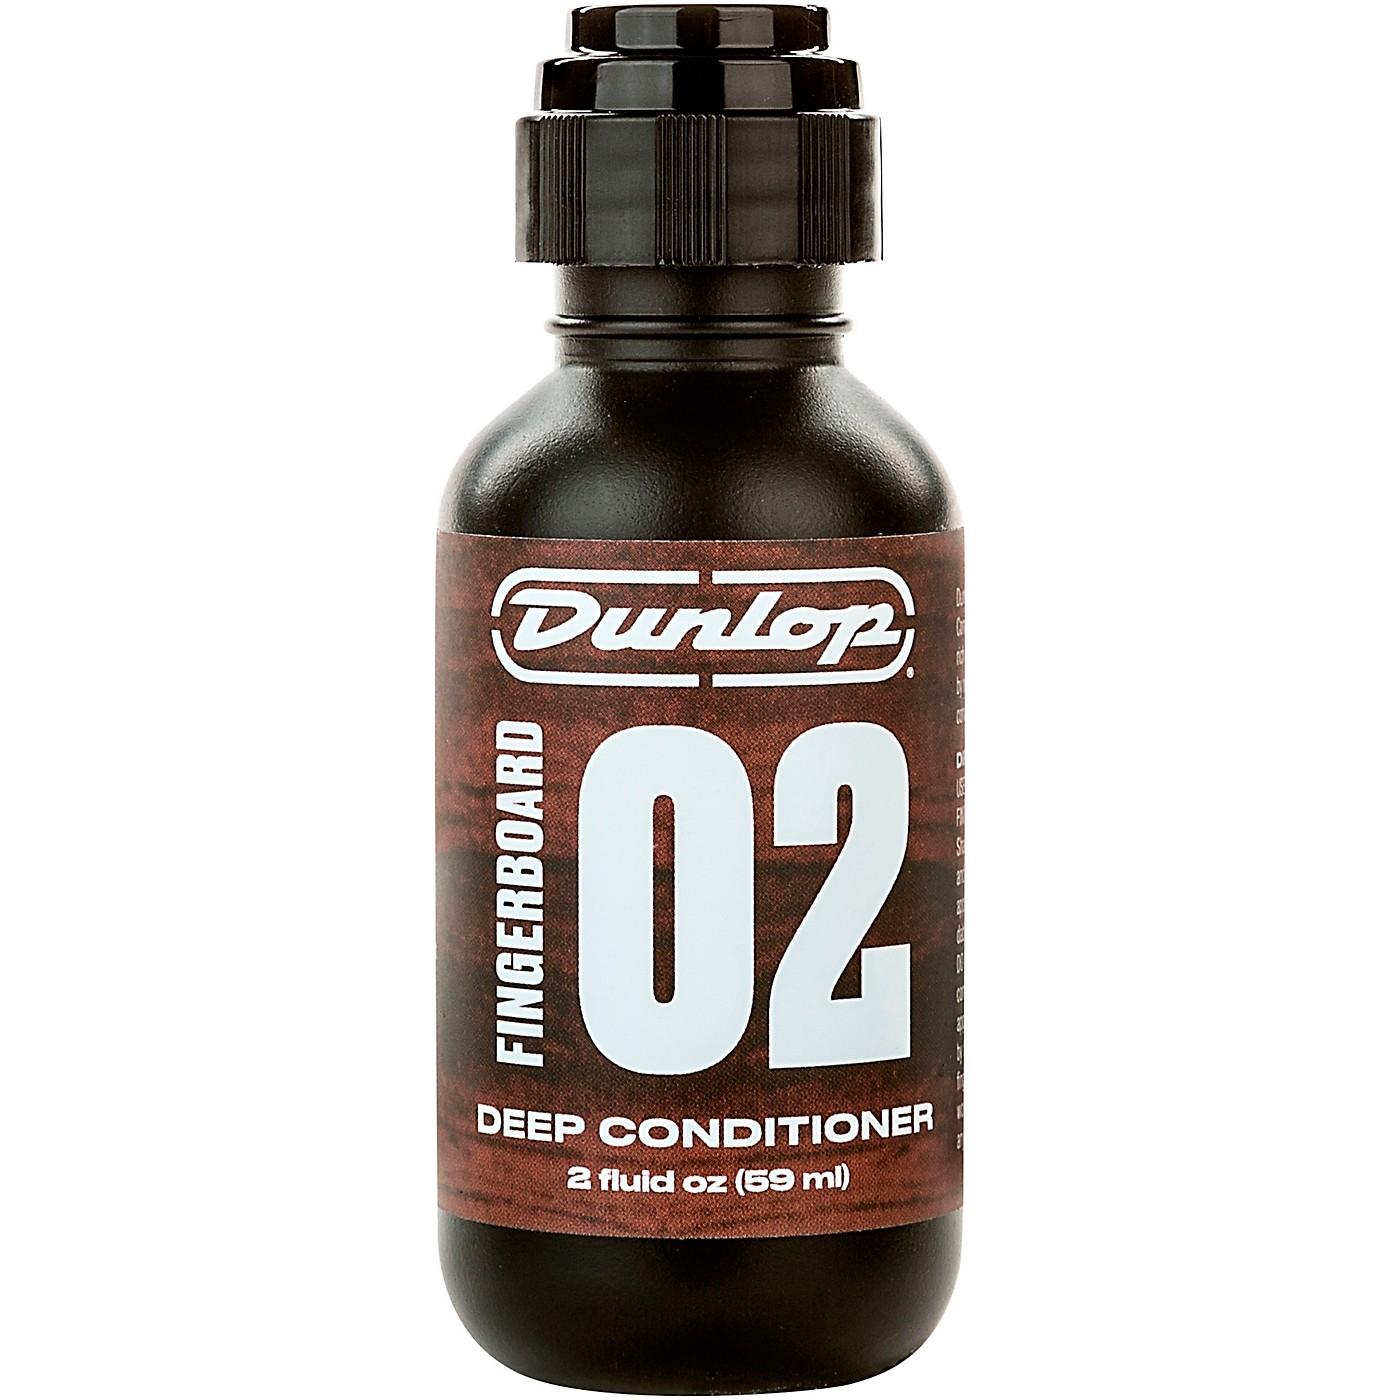 Dunlop Fingerboard 02 Deep Conditioner thumbnail